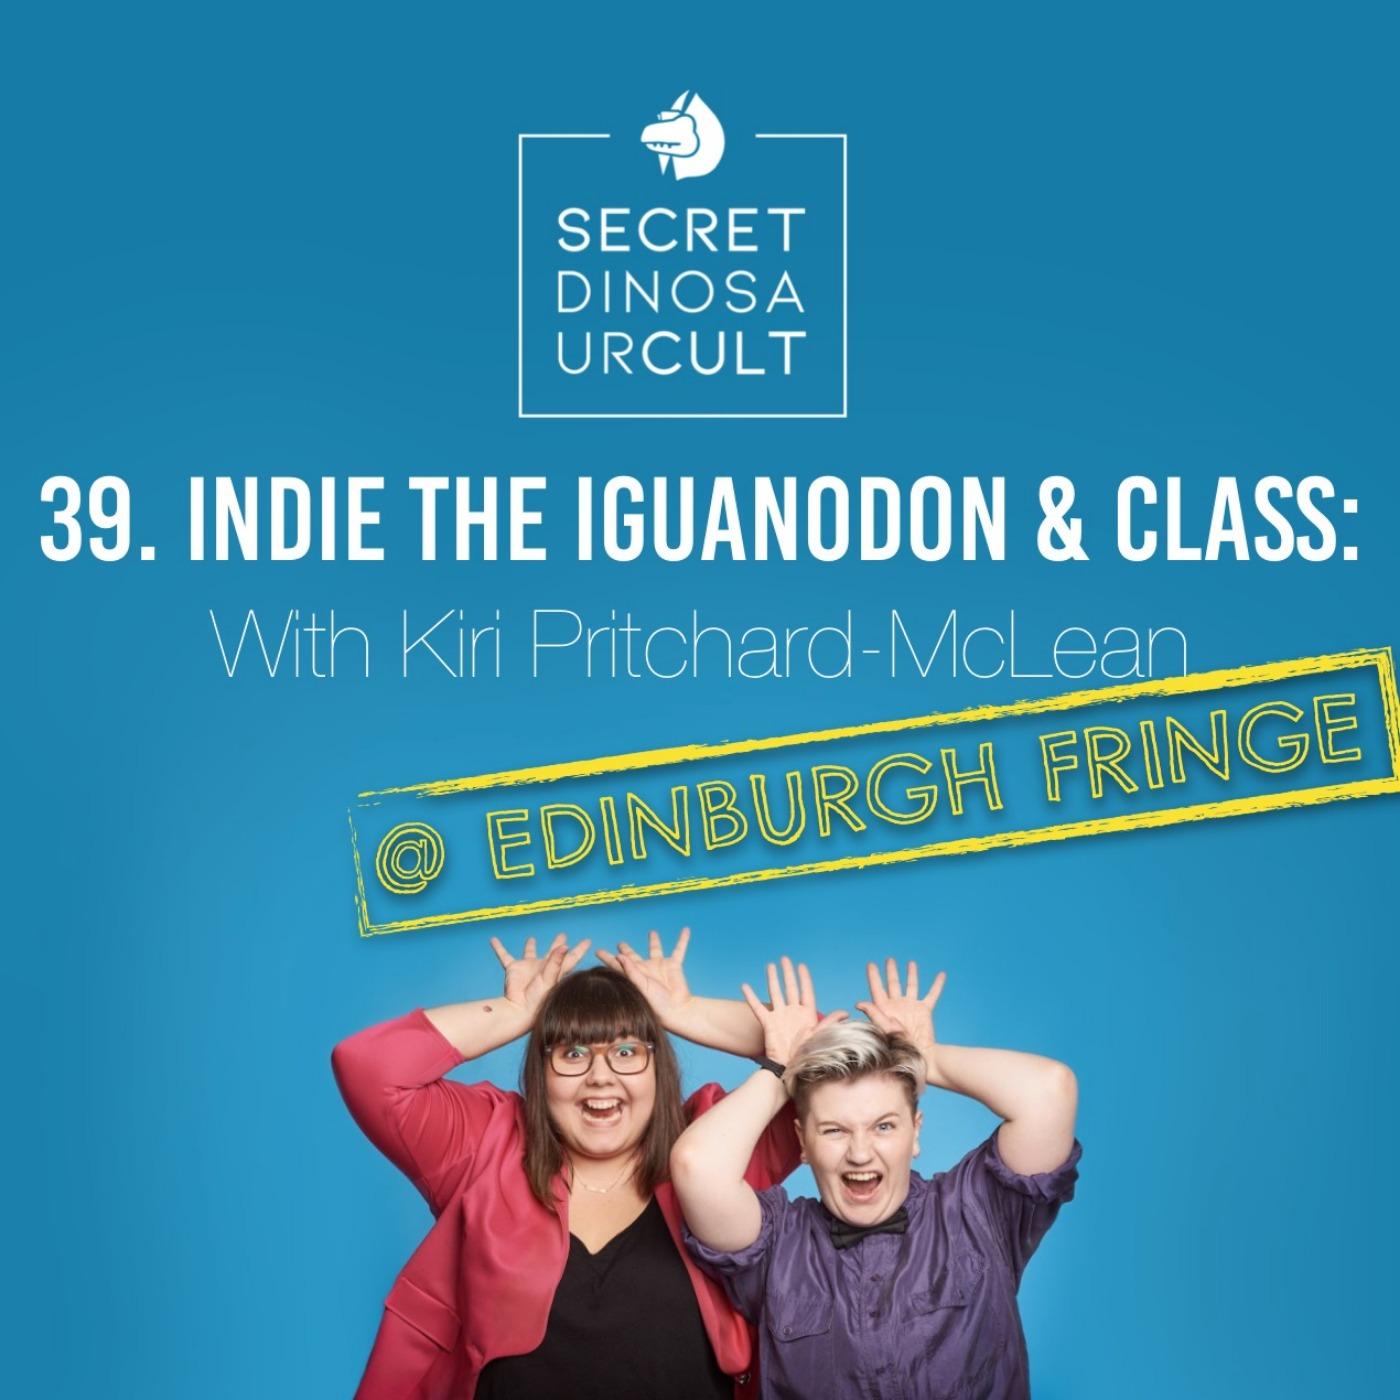 Indie the Iguanodon & Class with Kiri Pritchard-McLean